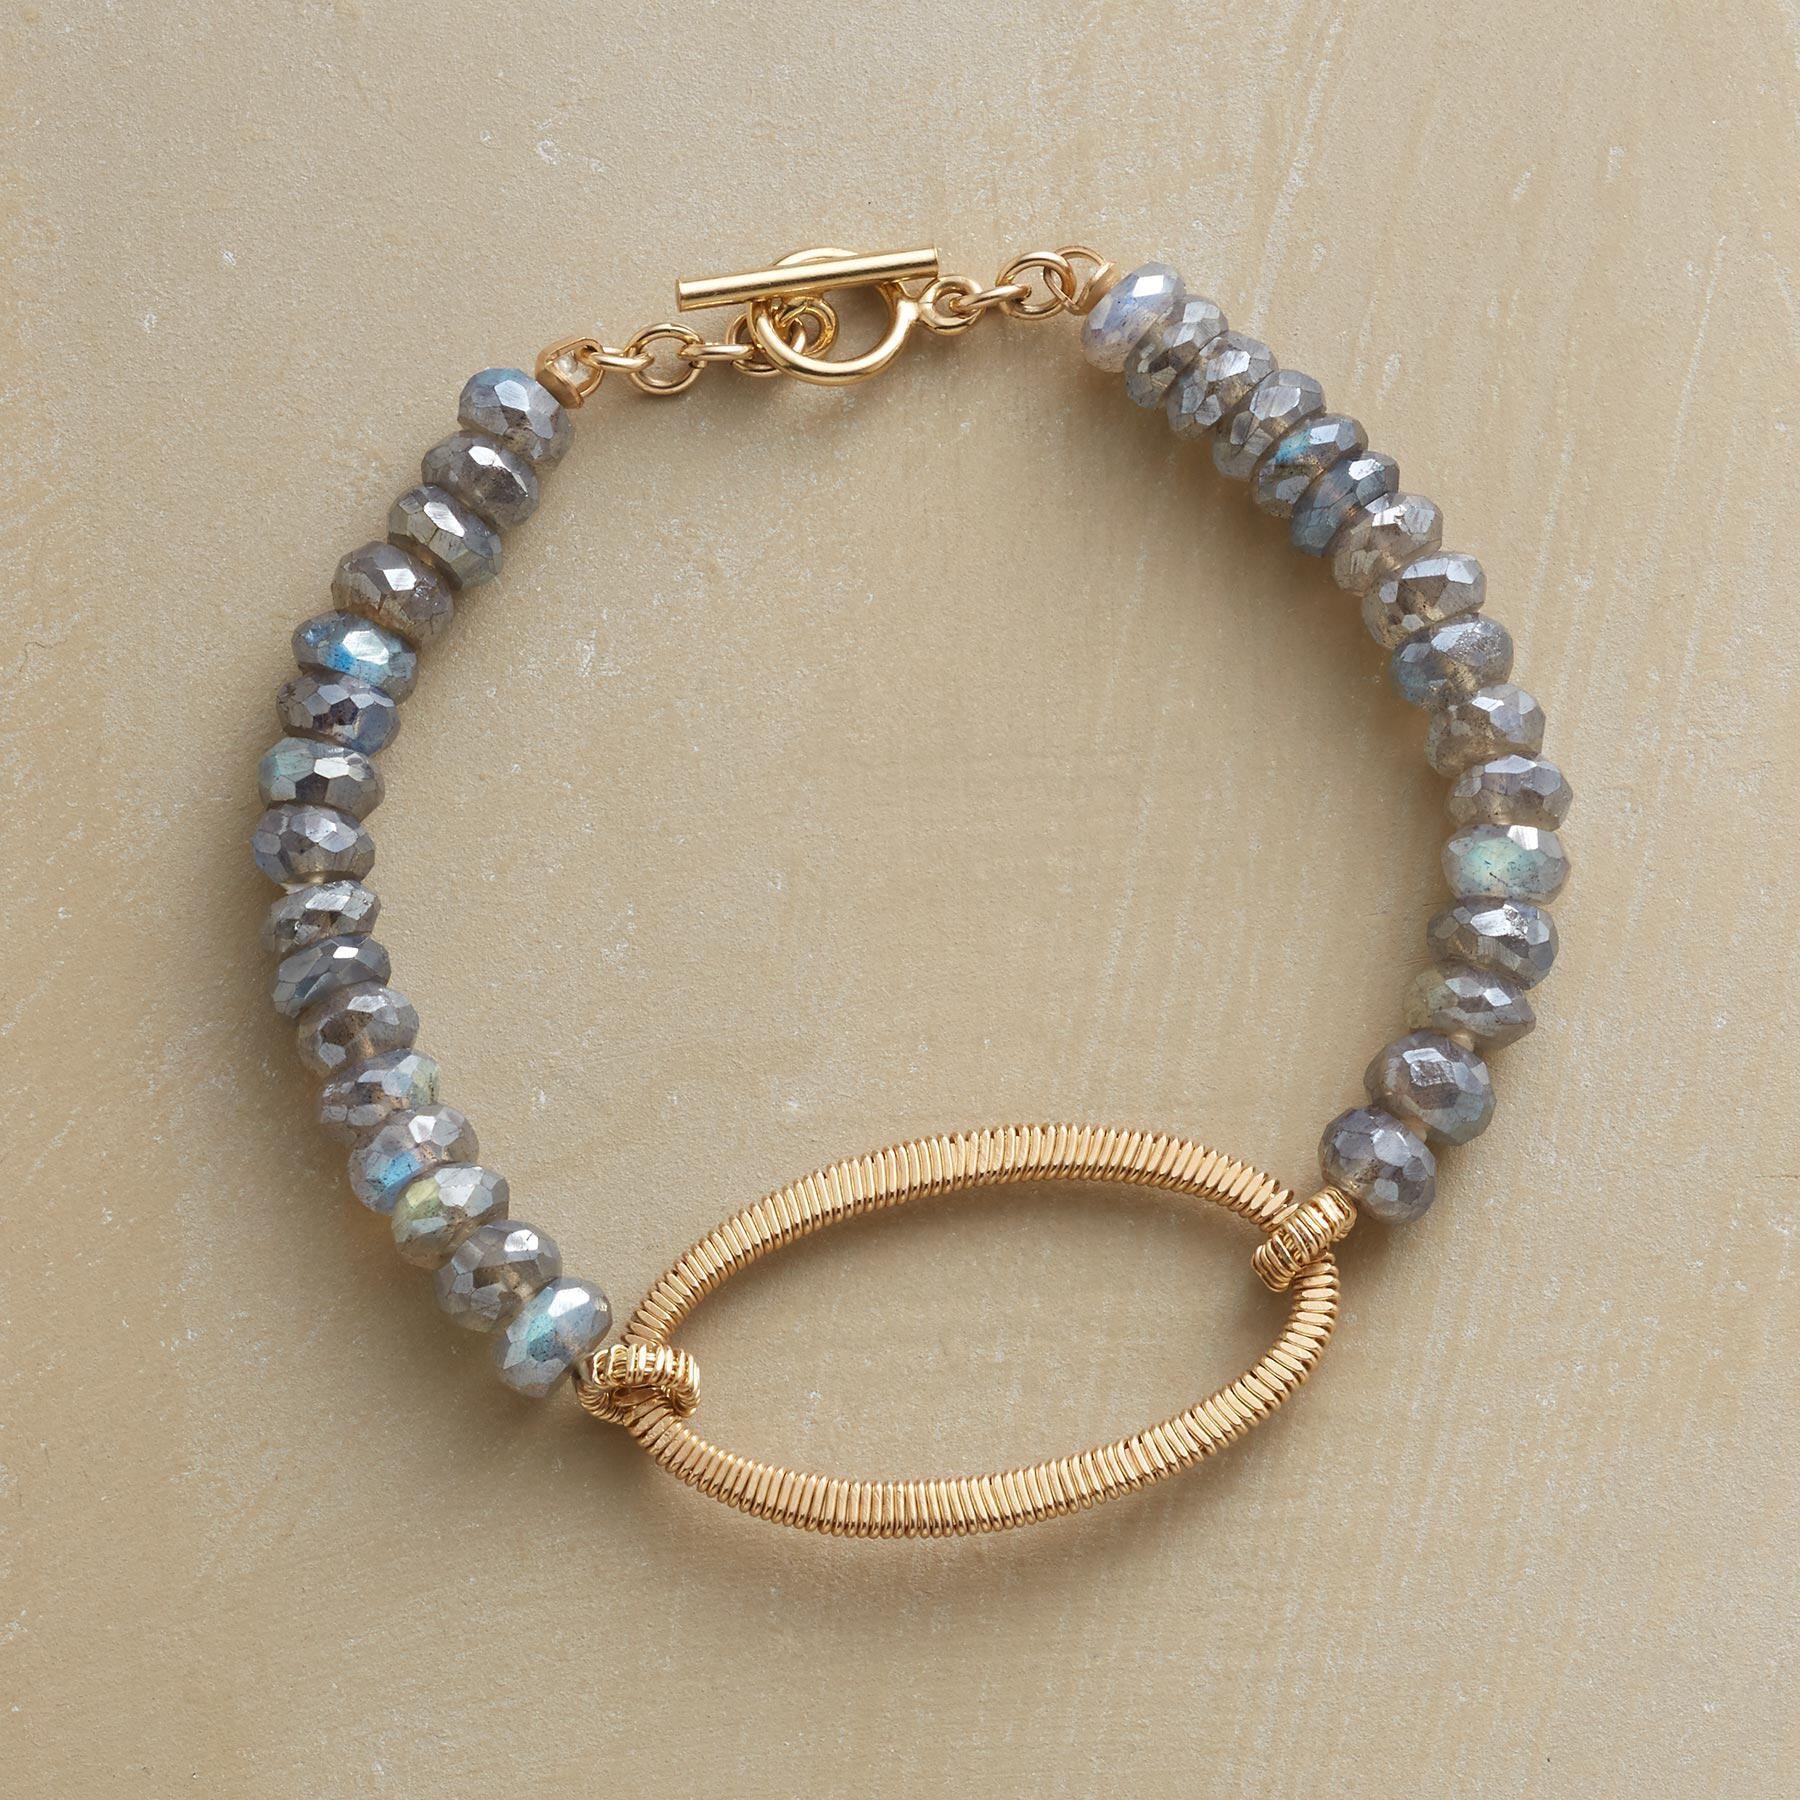 Modern Keepsake Bracelet Using An Age Old Wire Wrapping